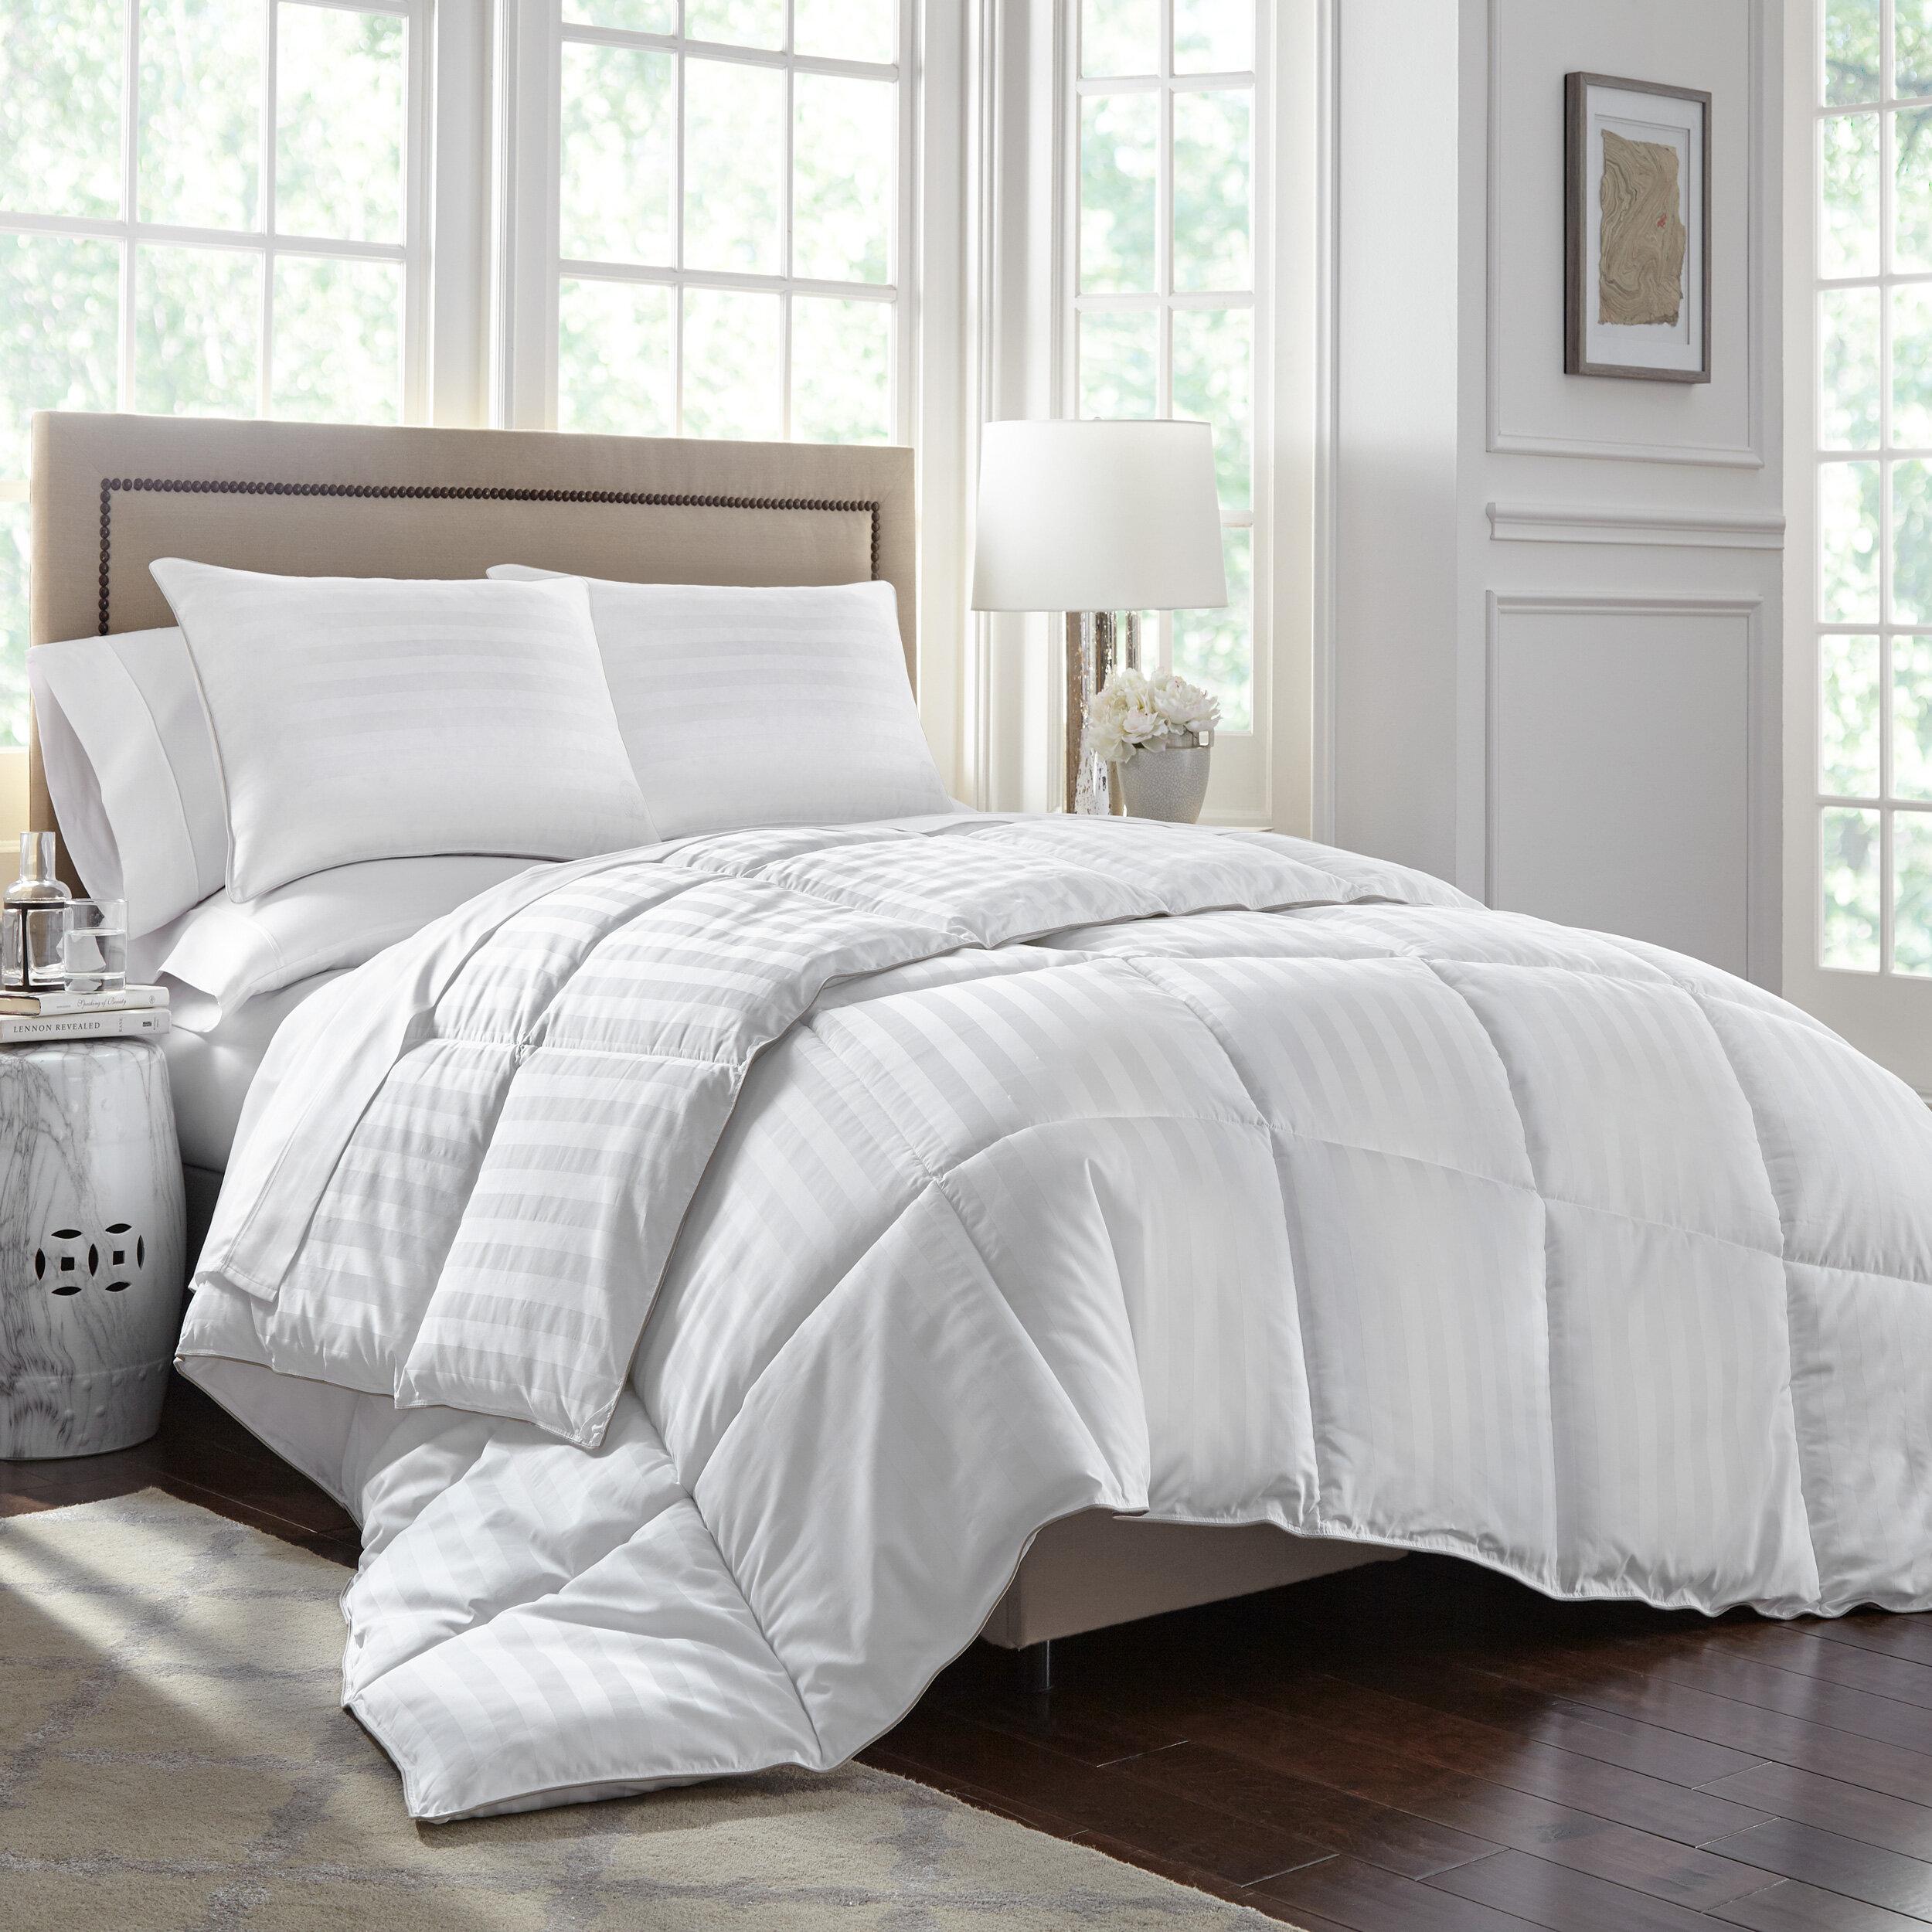 Duvets Beautiful Modern Cozy Warm Soft Luxurious Down Alt Stripe All Season Comforter Home Furniture Diy Omnitel Com Na